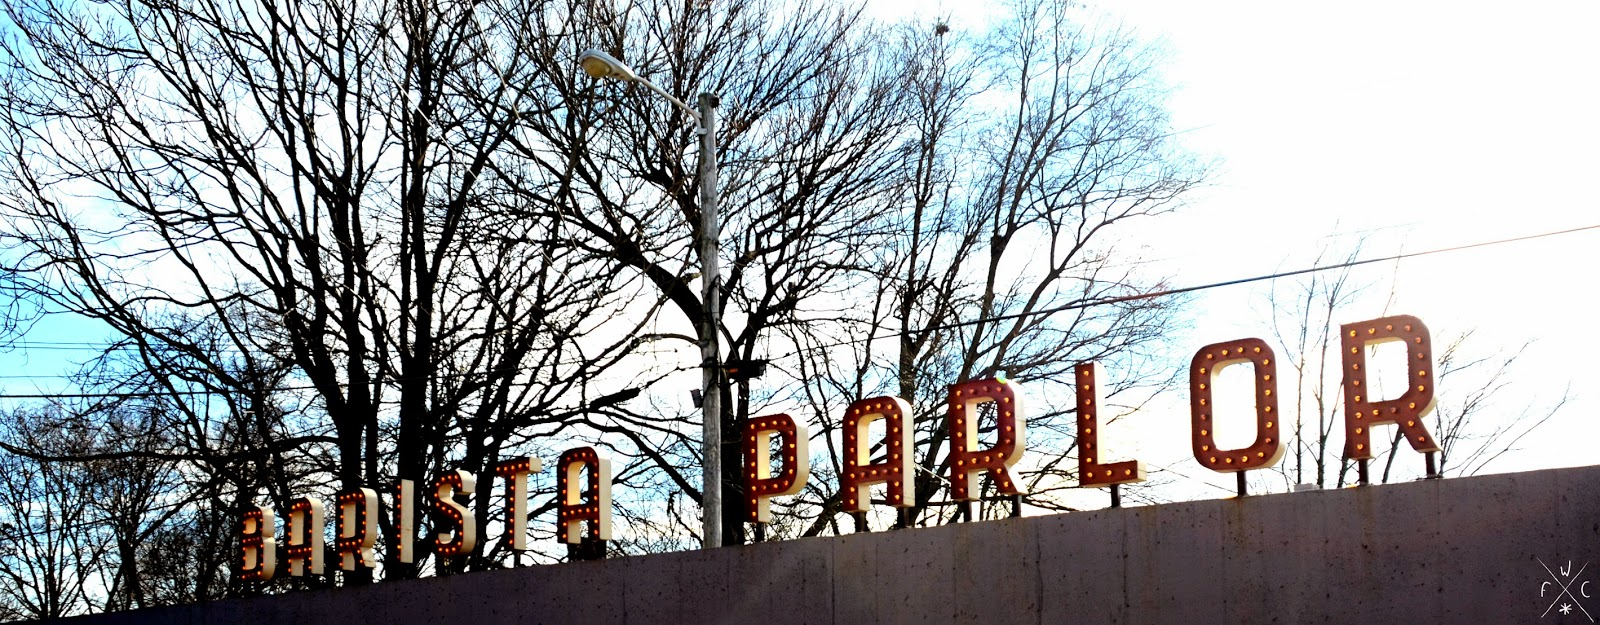 Barista Parlor - Nashville, Tennessee, USA